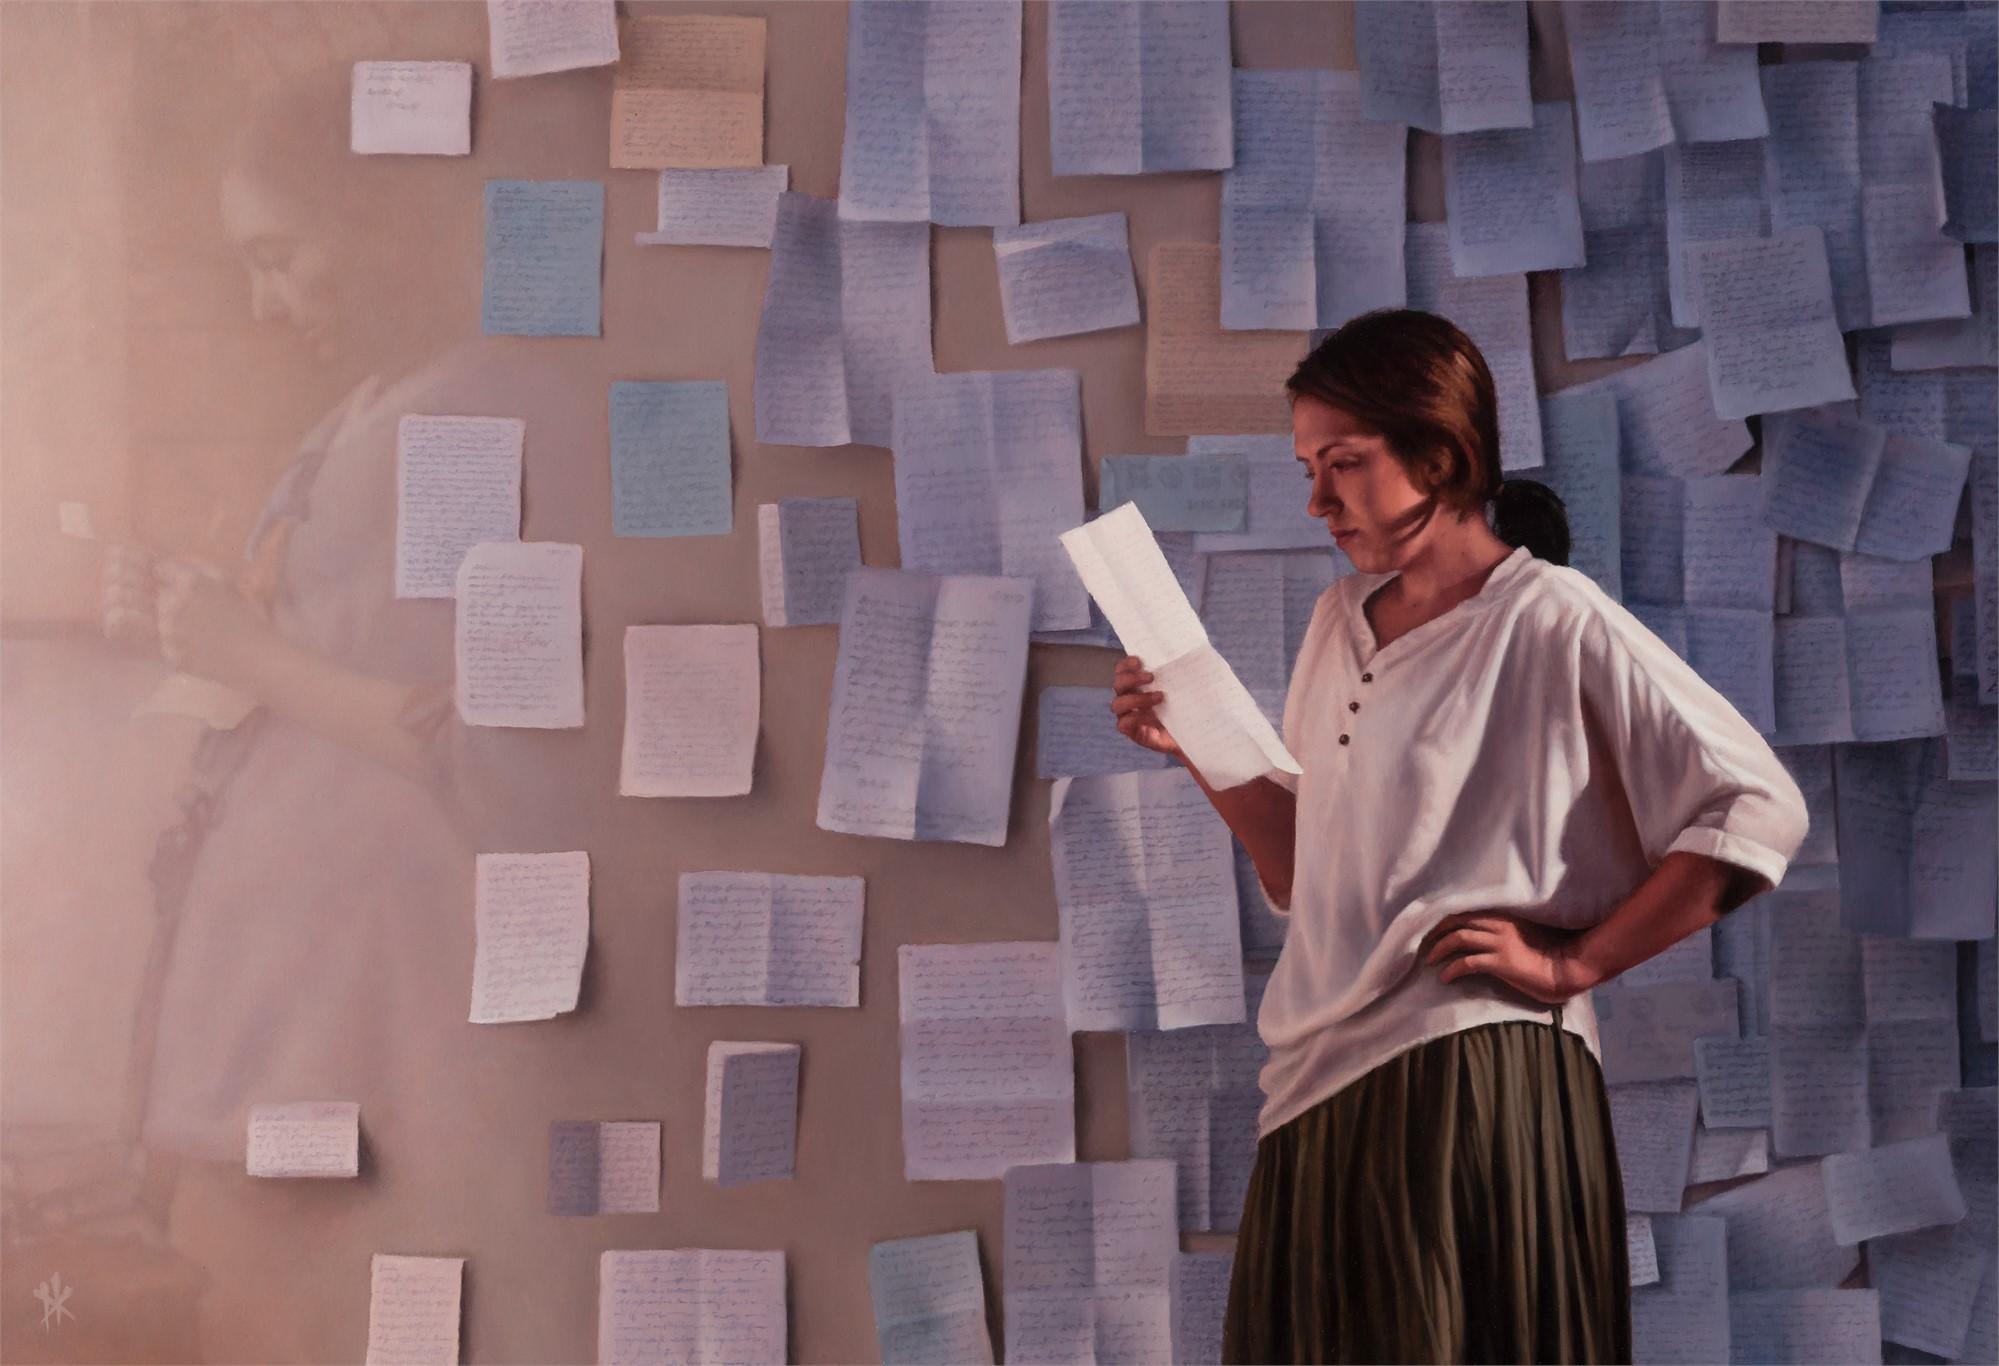 A Correspondence by Patrick Kramer